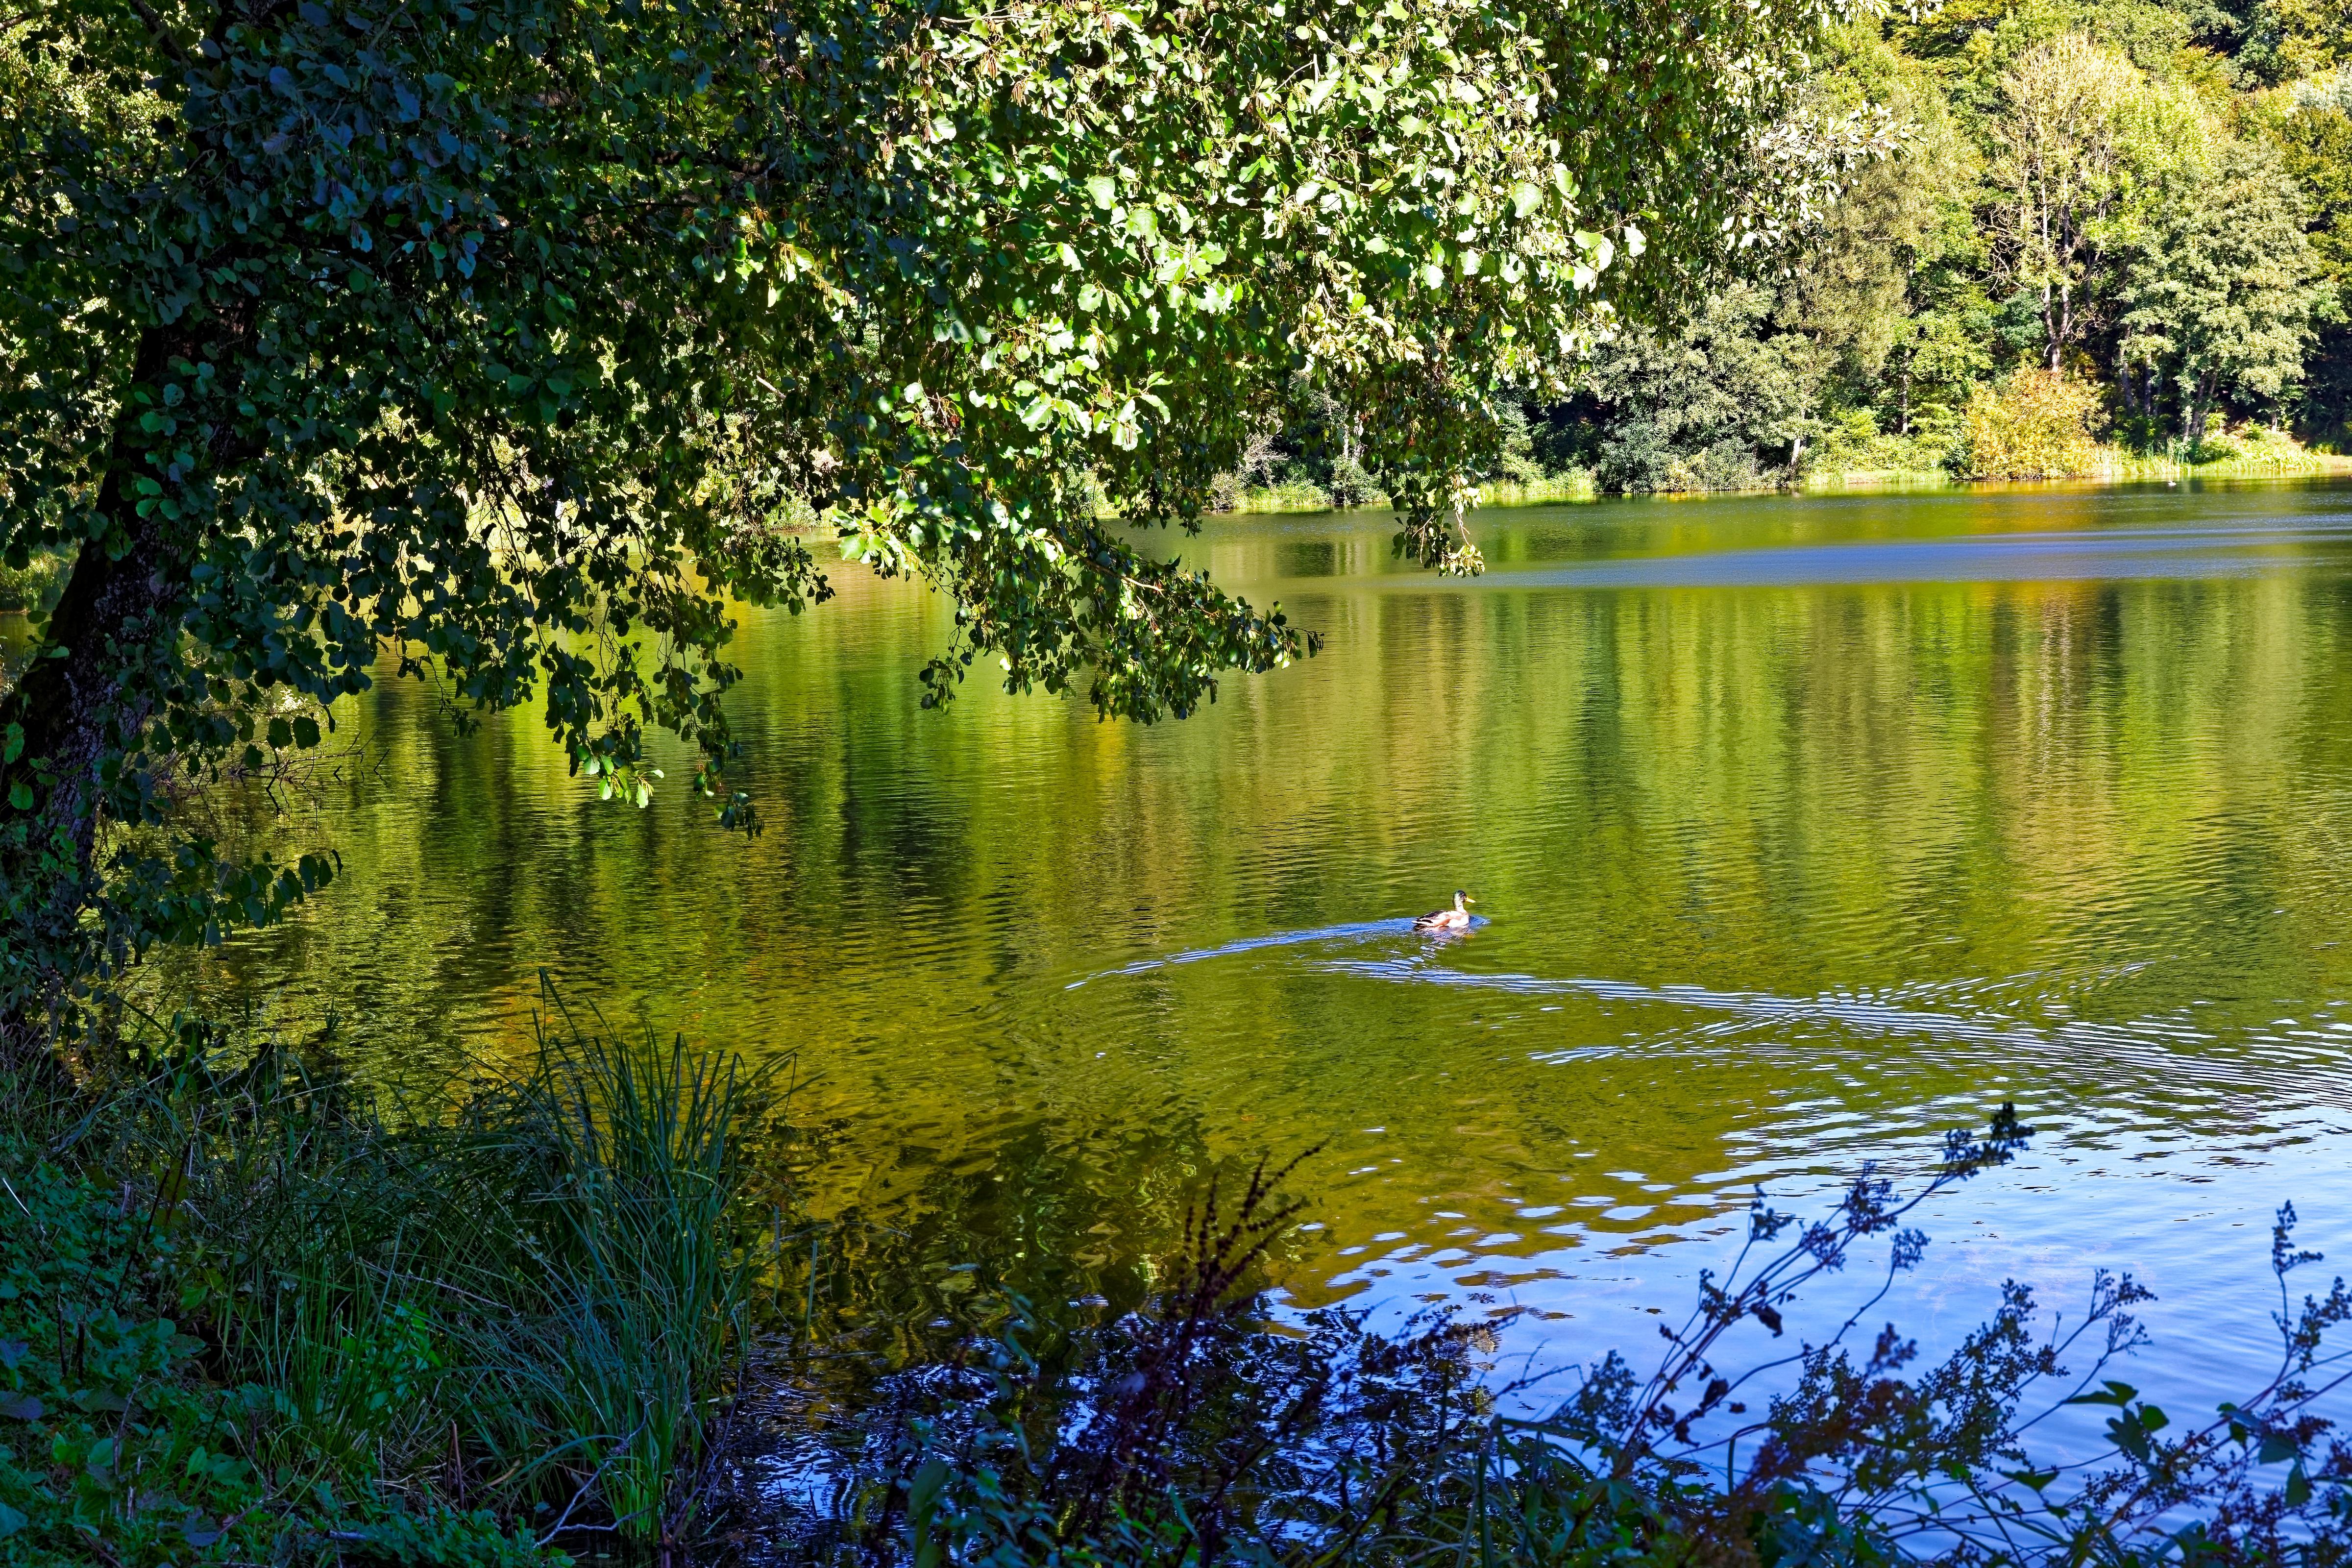 озеро зелень лето без смс